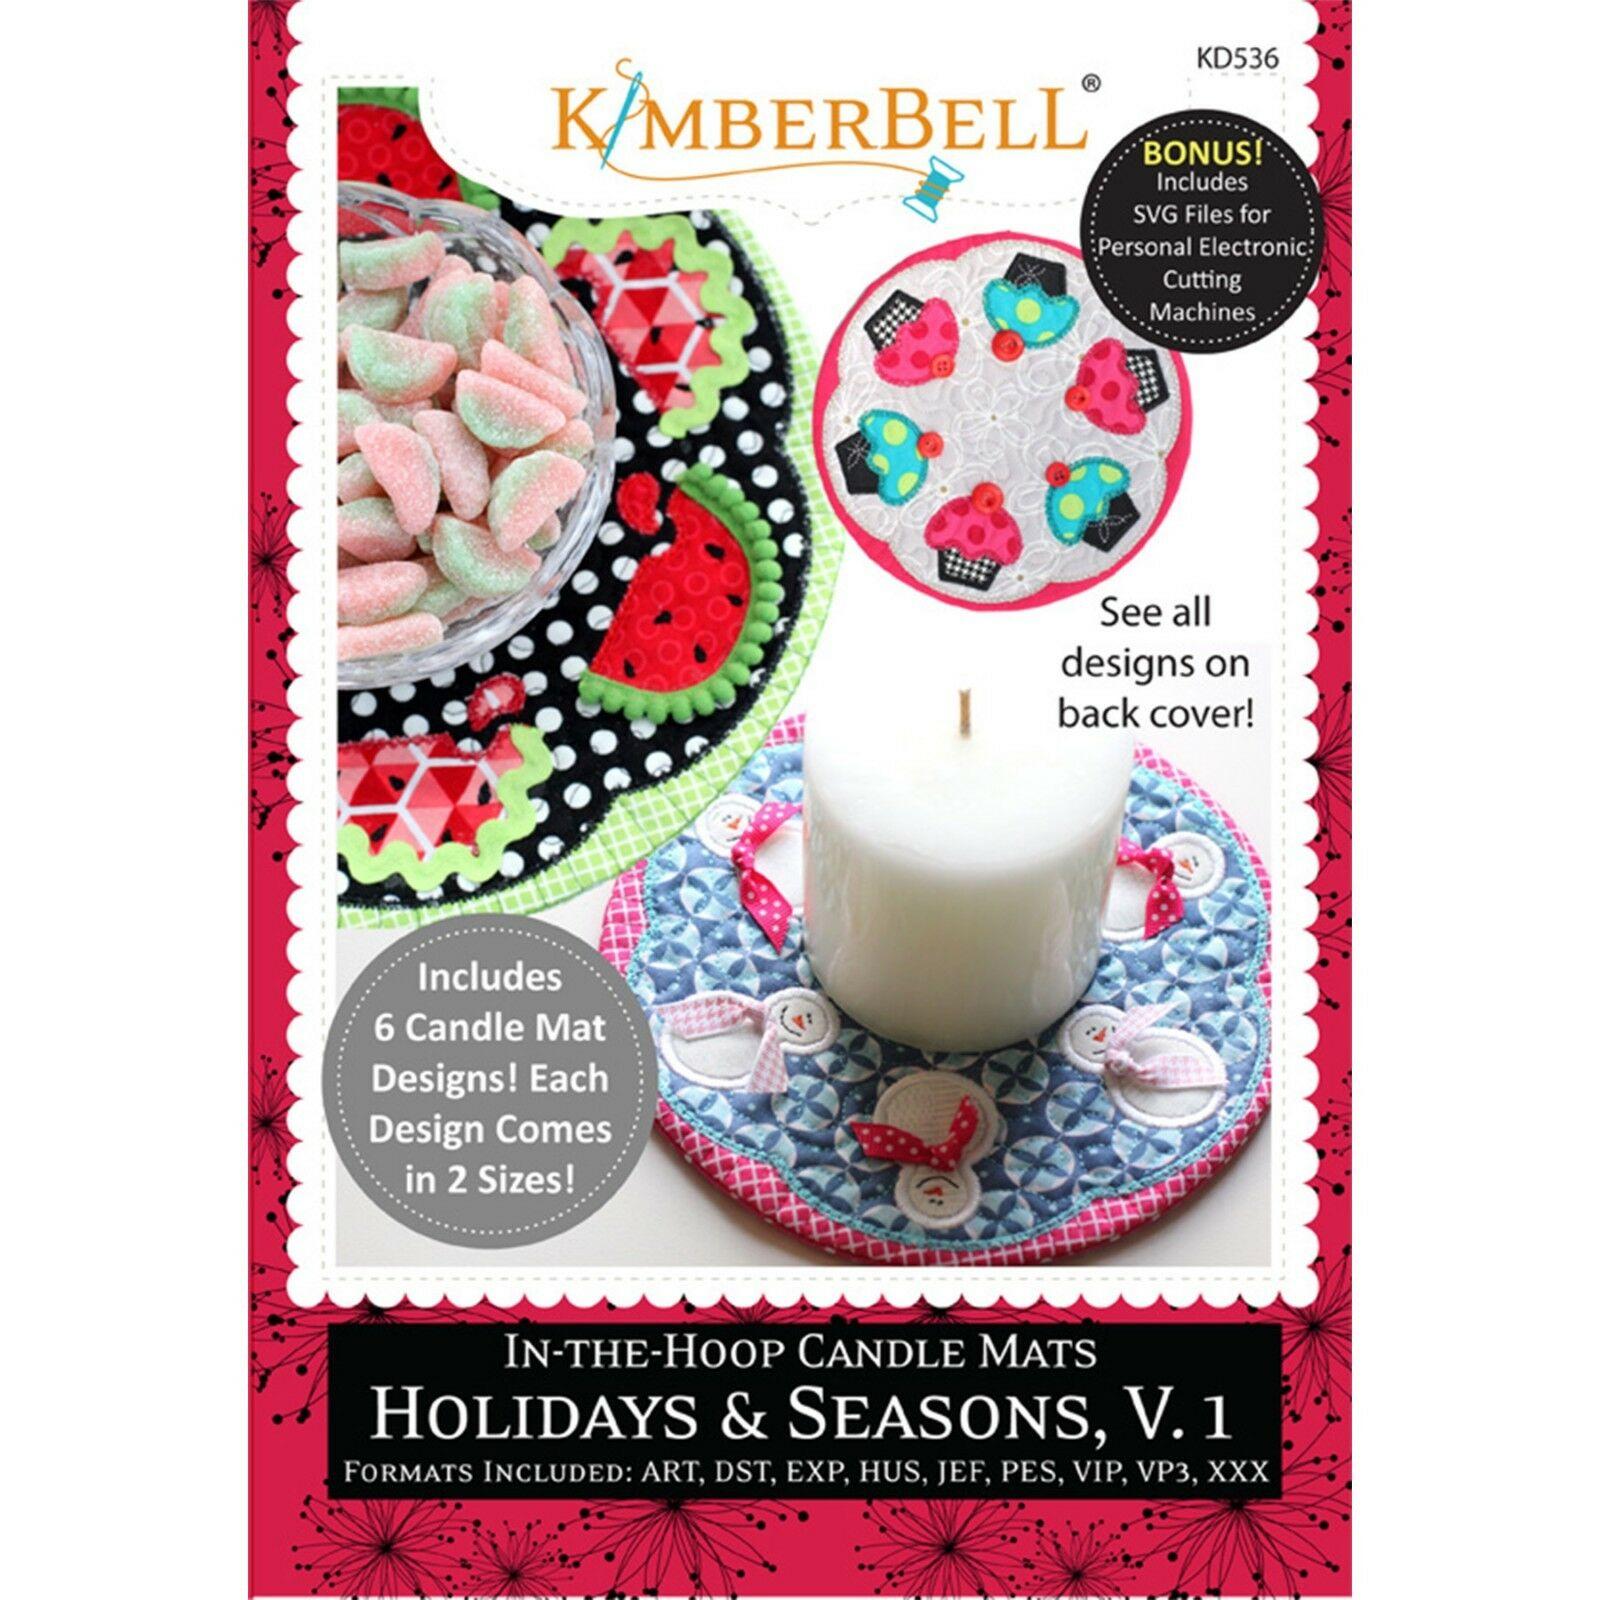 KIMBERBELLIN-THE-HOOP CANDLE MATS: HOLIDAYS & SEASONS, VOLUME 1